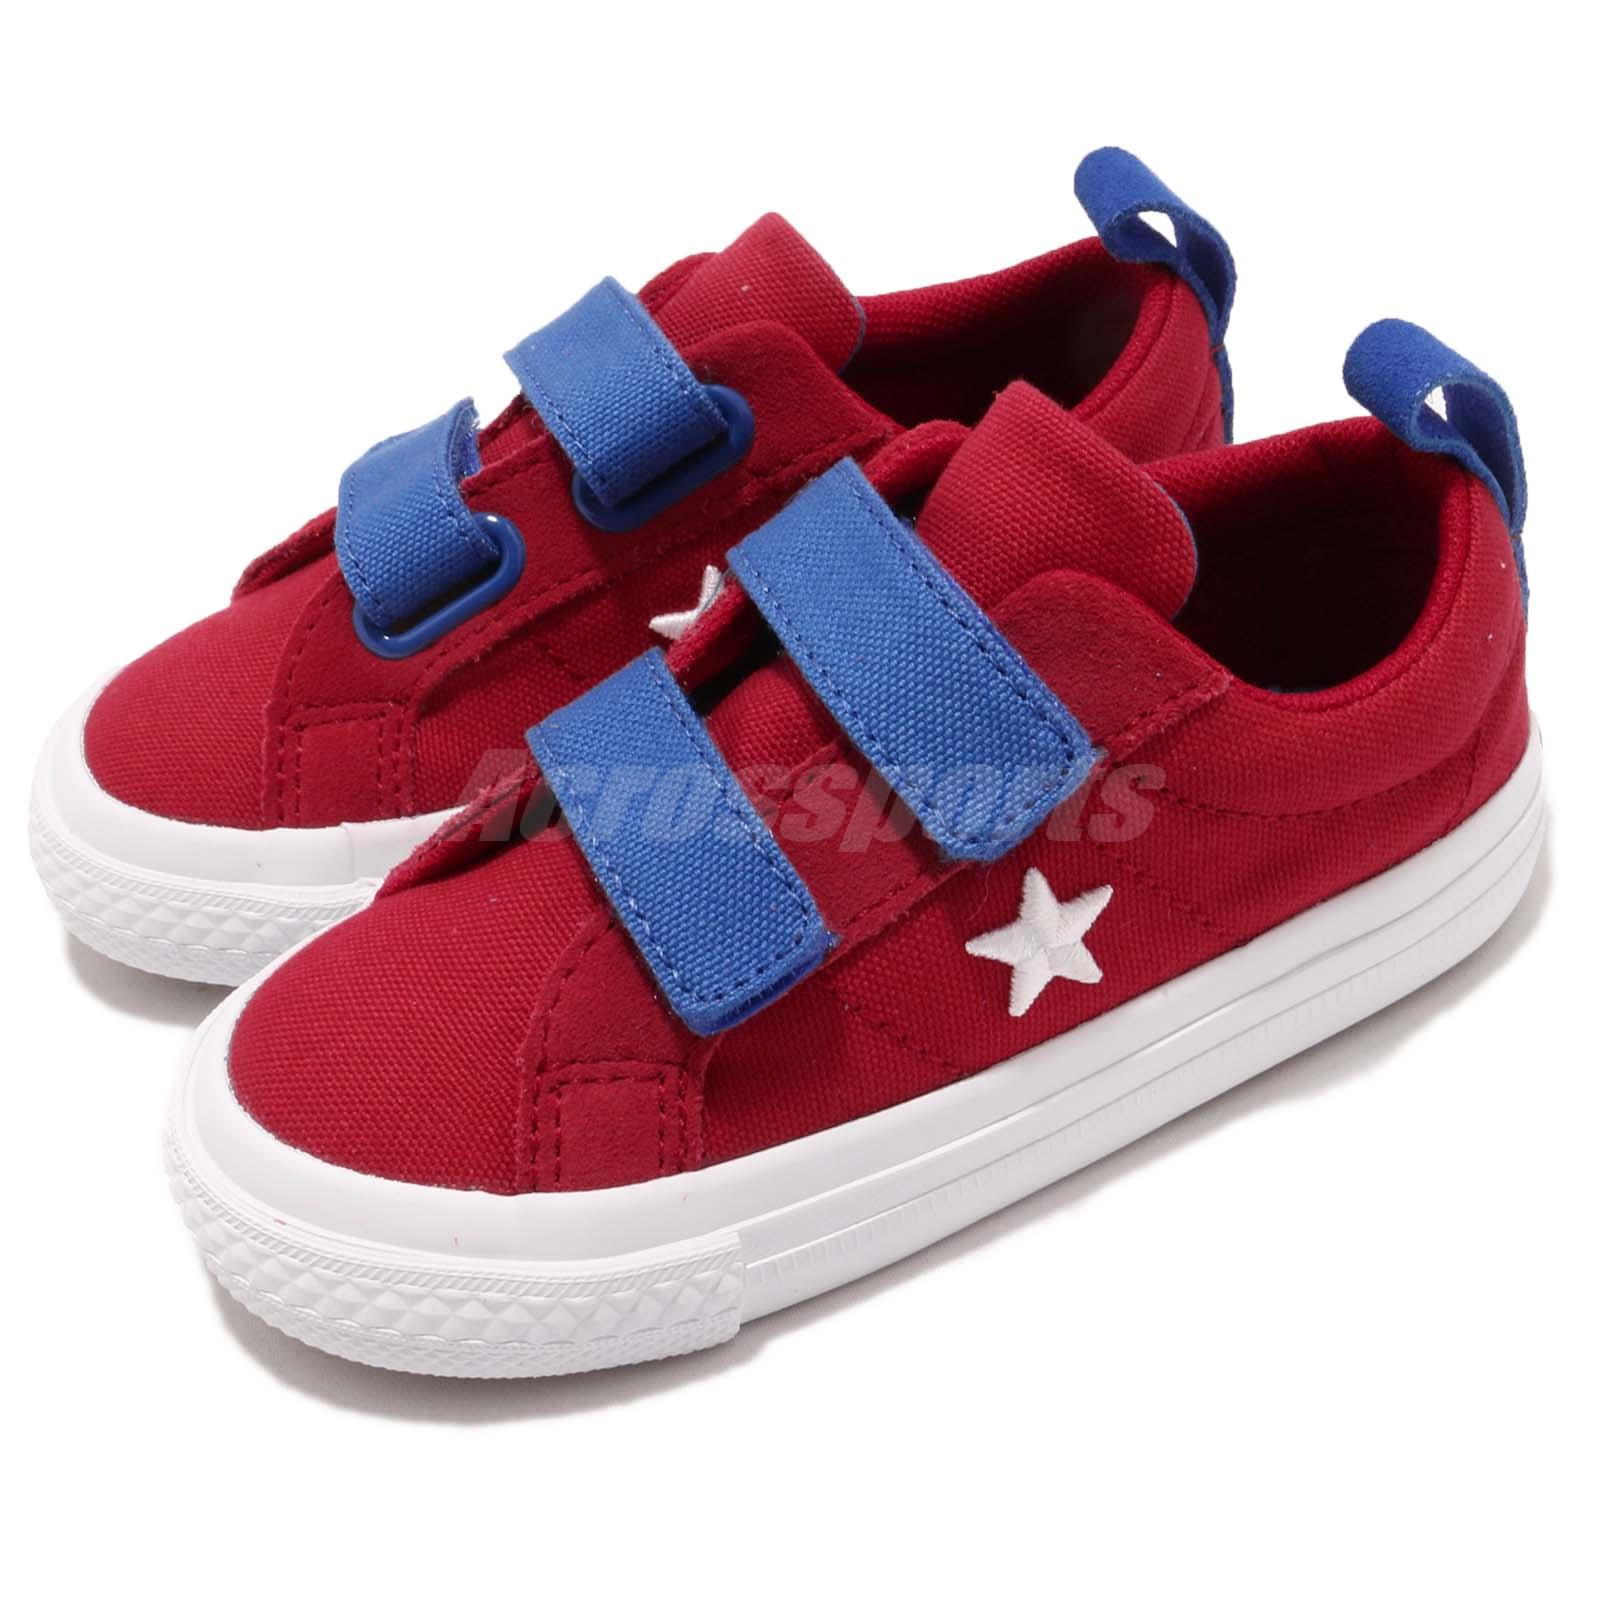 de9ec8dd5c49 Details about Converse One Star 2V Canvas Straps Red Blue White Infant  Toddler Shoes 760765C